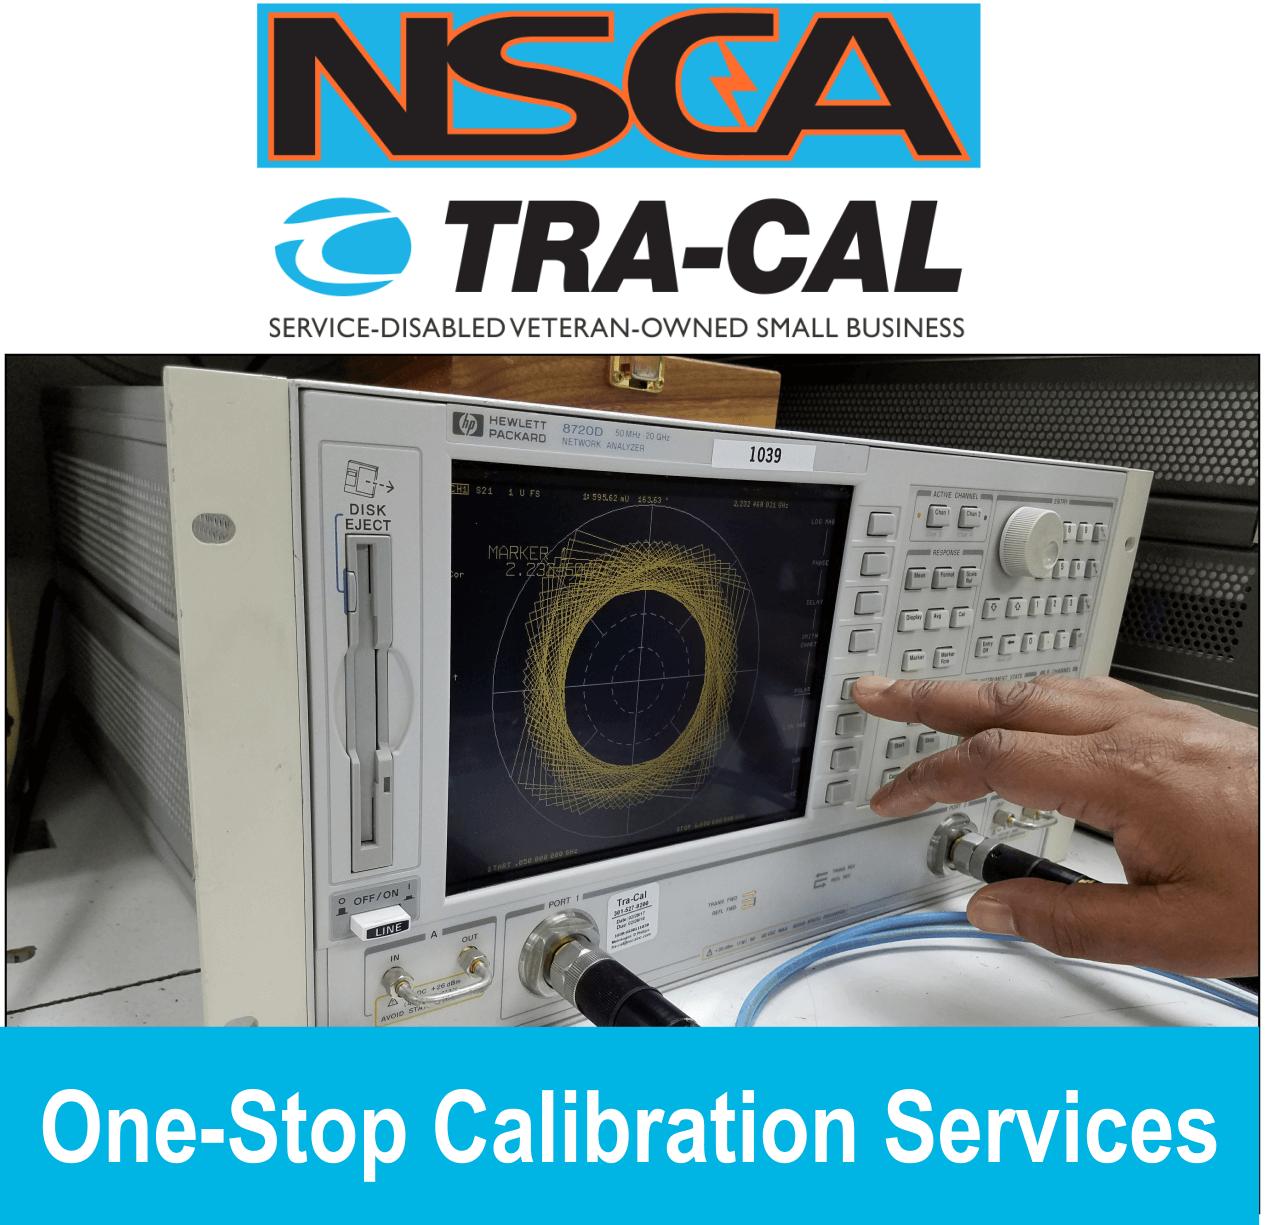 Cable Calibration Services